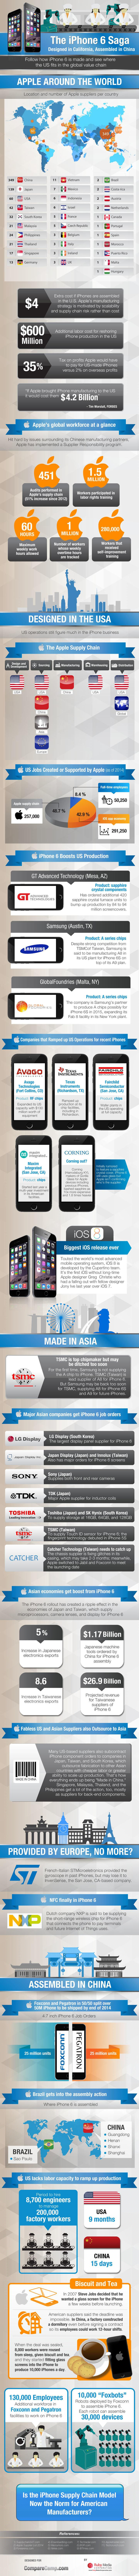 The #IPhone 6 Saga #Infographic